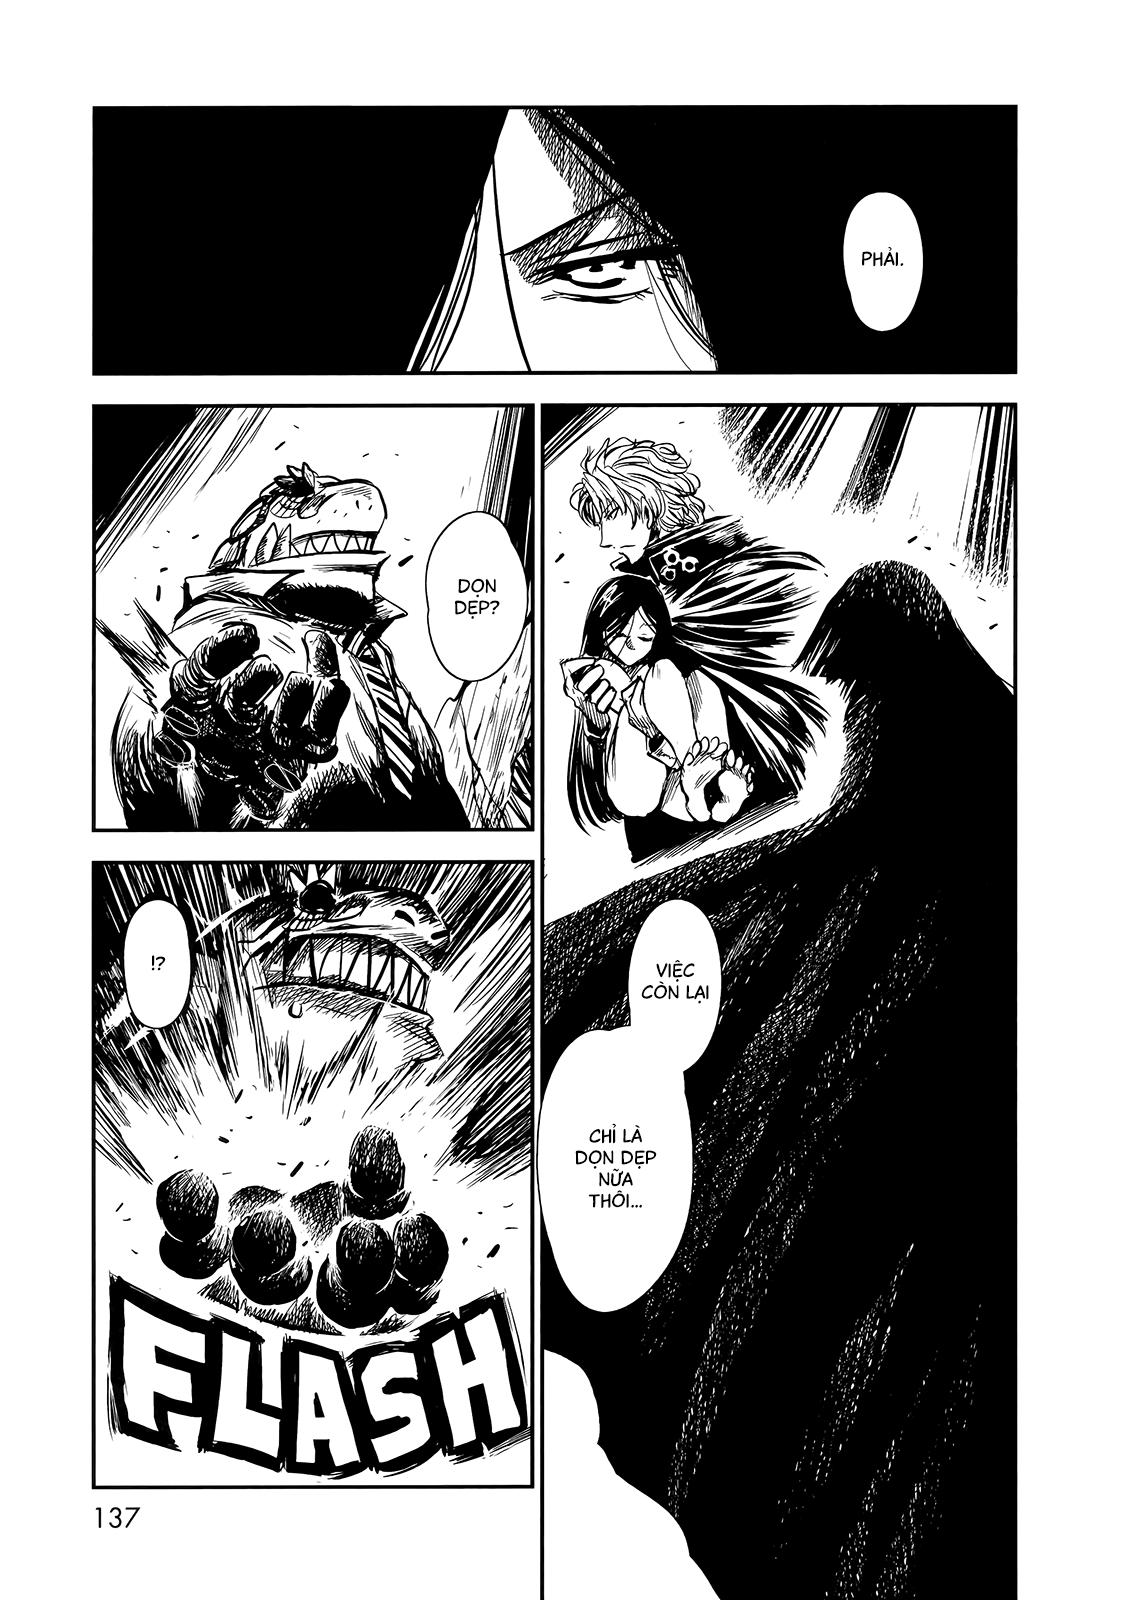 Keyman: The Hand of Judgement